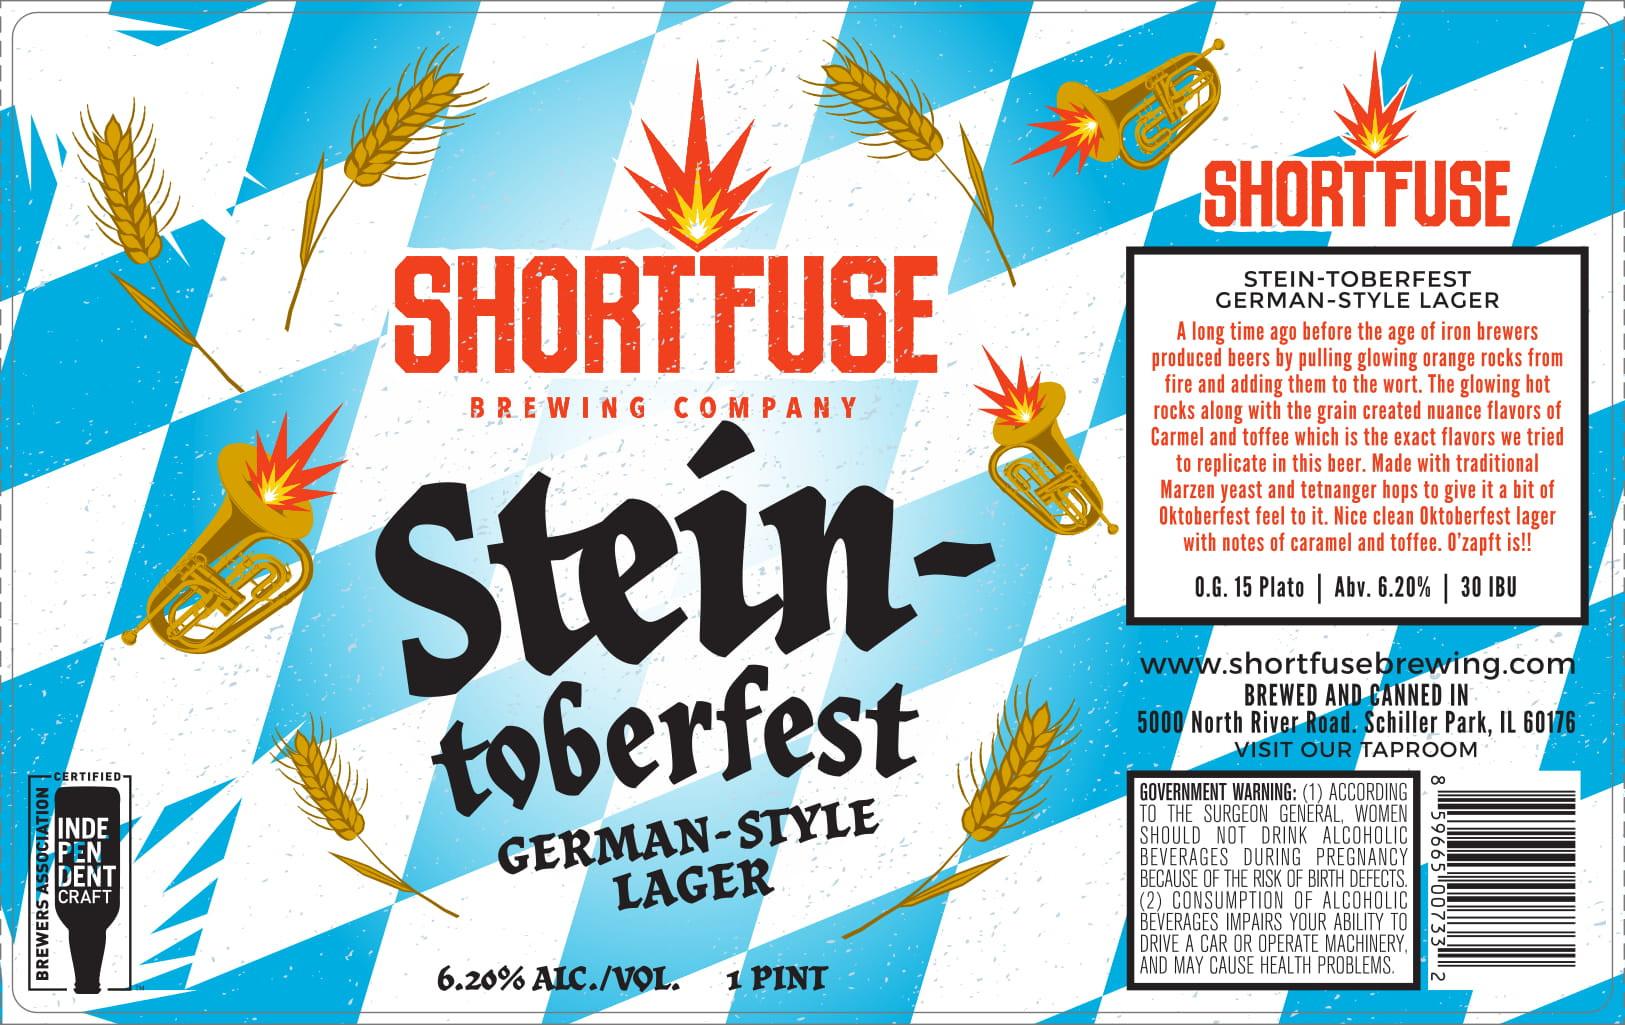 Stein-Toberfest